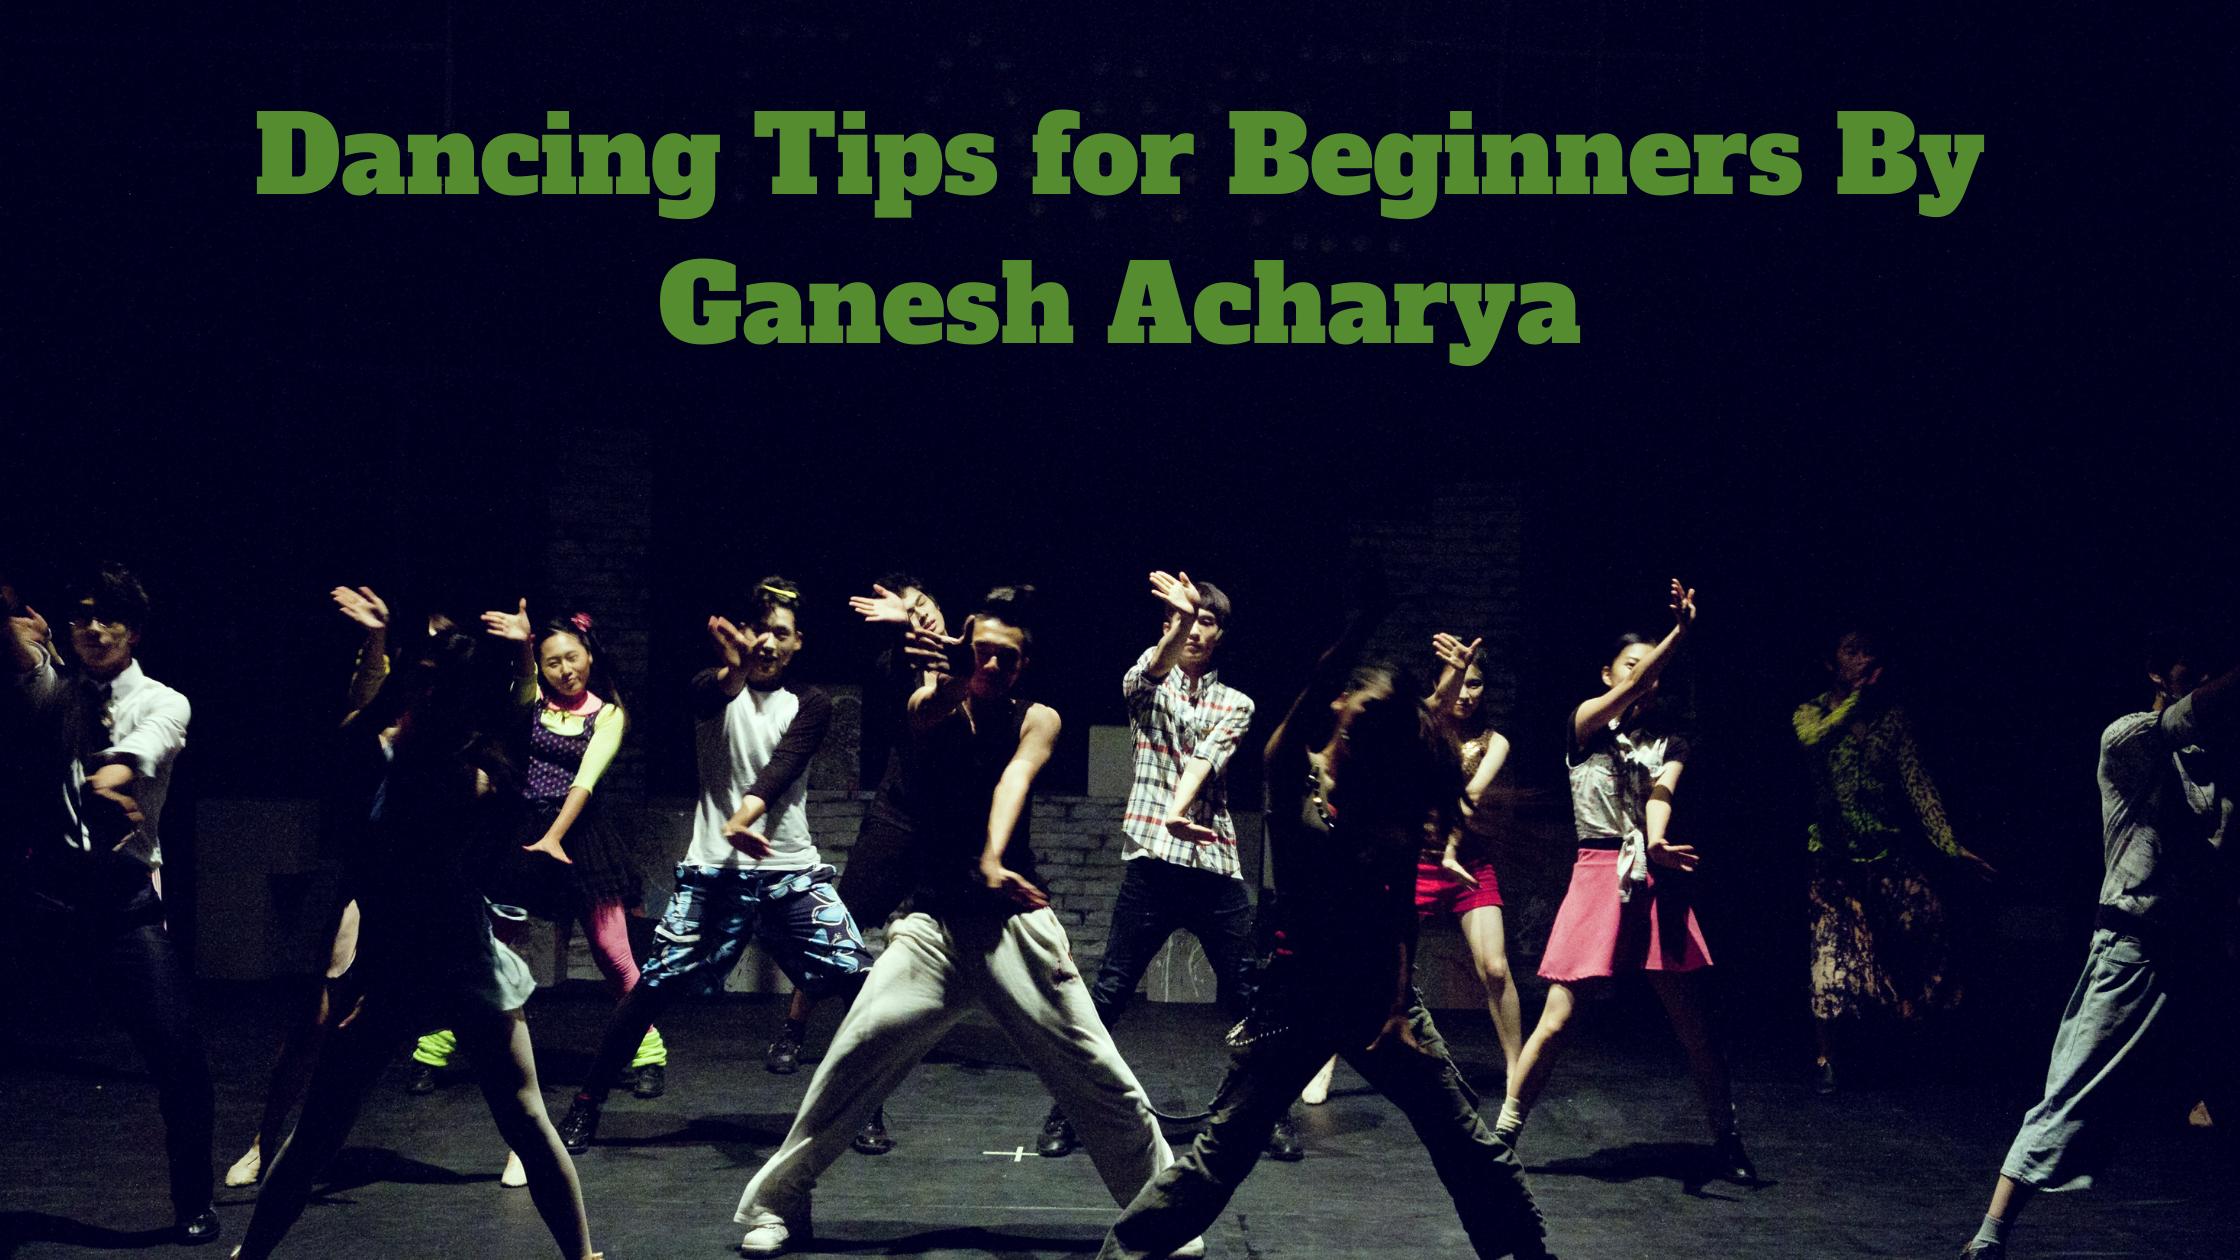 Dancing Tips for Beginners By Ganesh Acharya